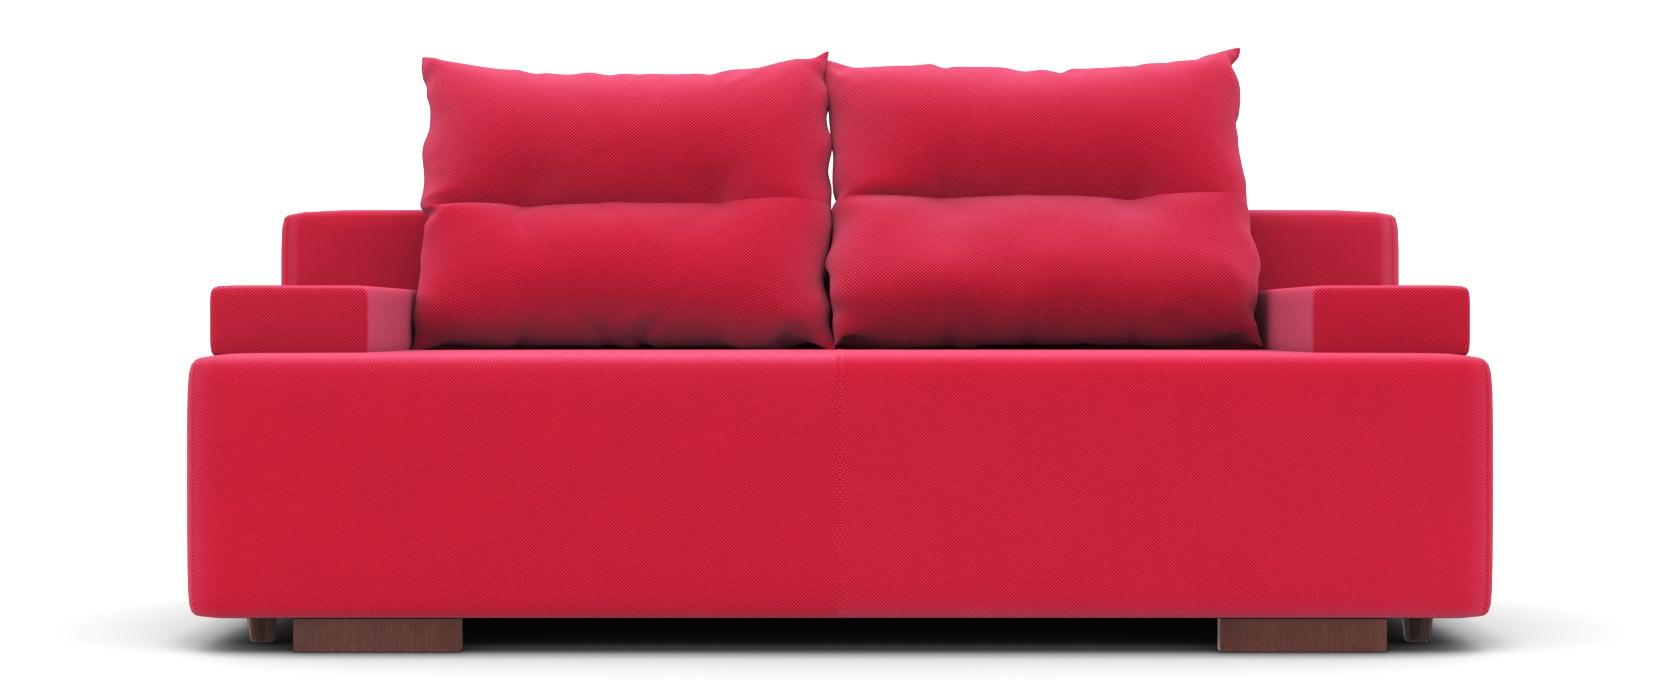 Трехместный диван Marta - Pufetto